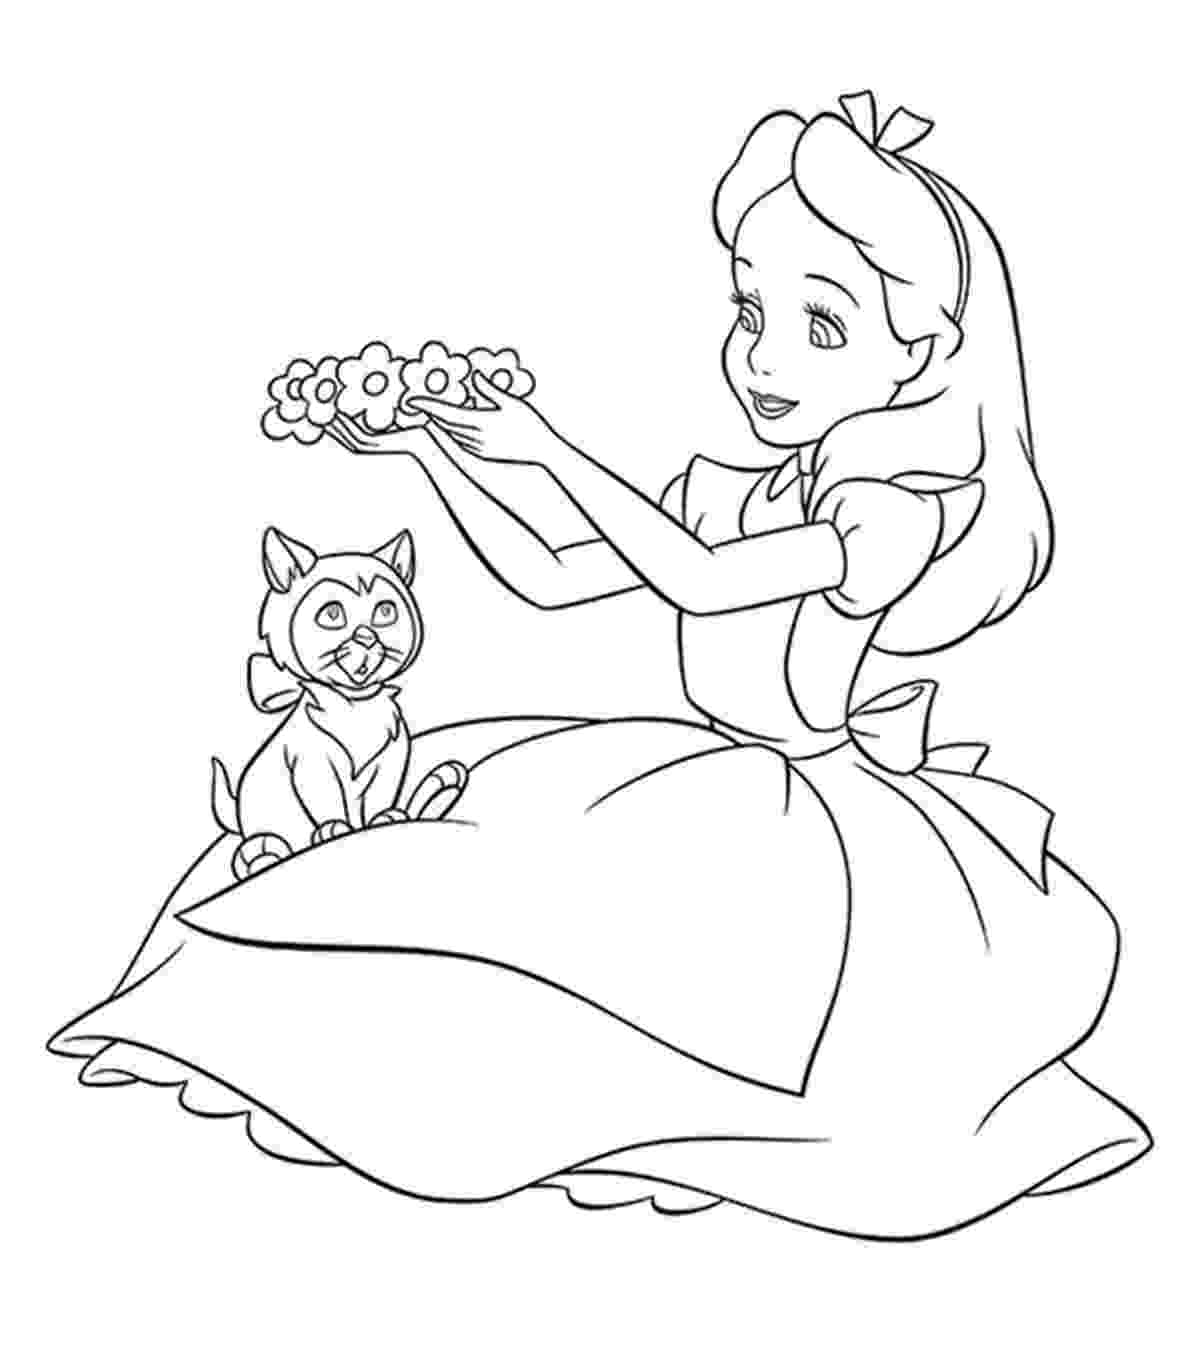 coloring pages disney disney princess mermaid coloring pages coloring pages disney